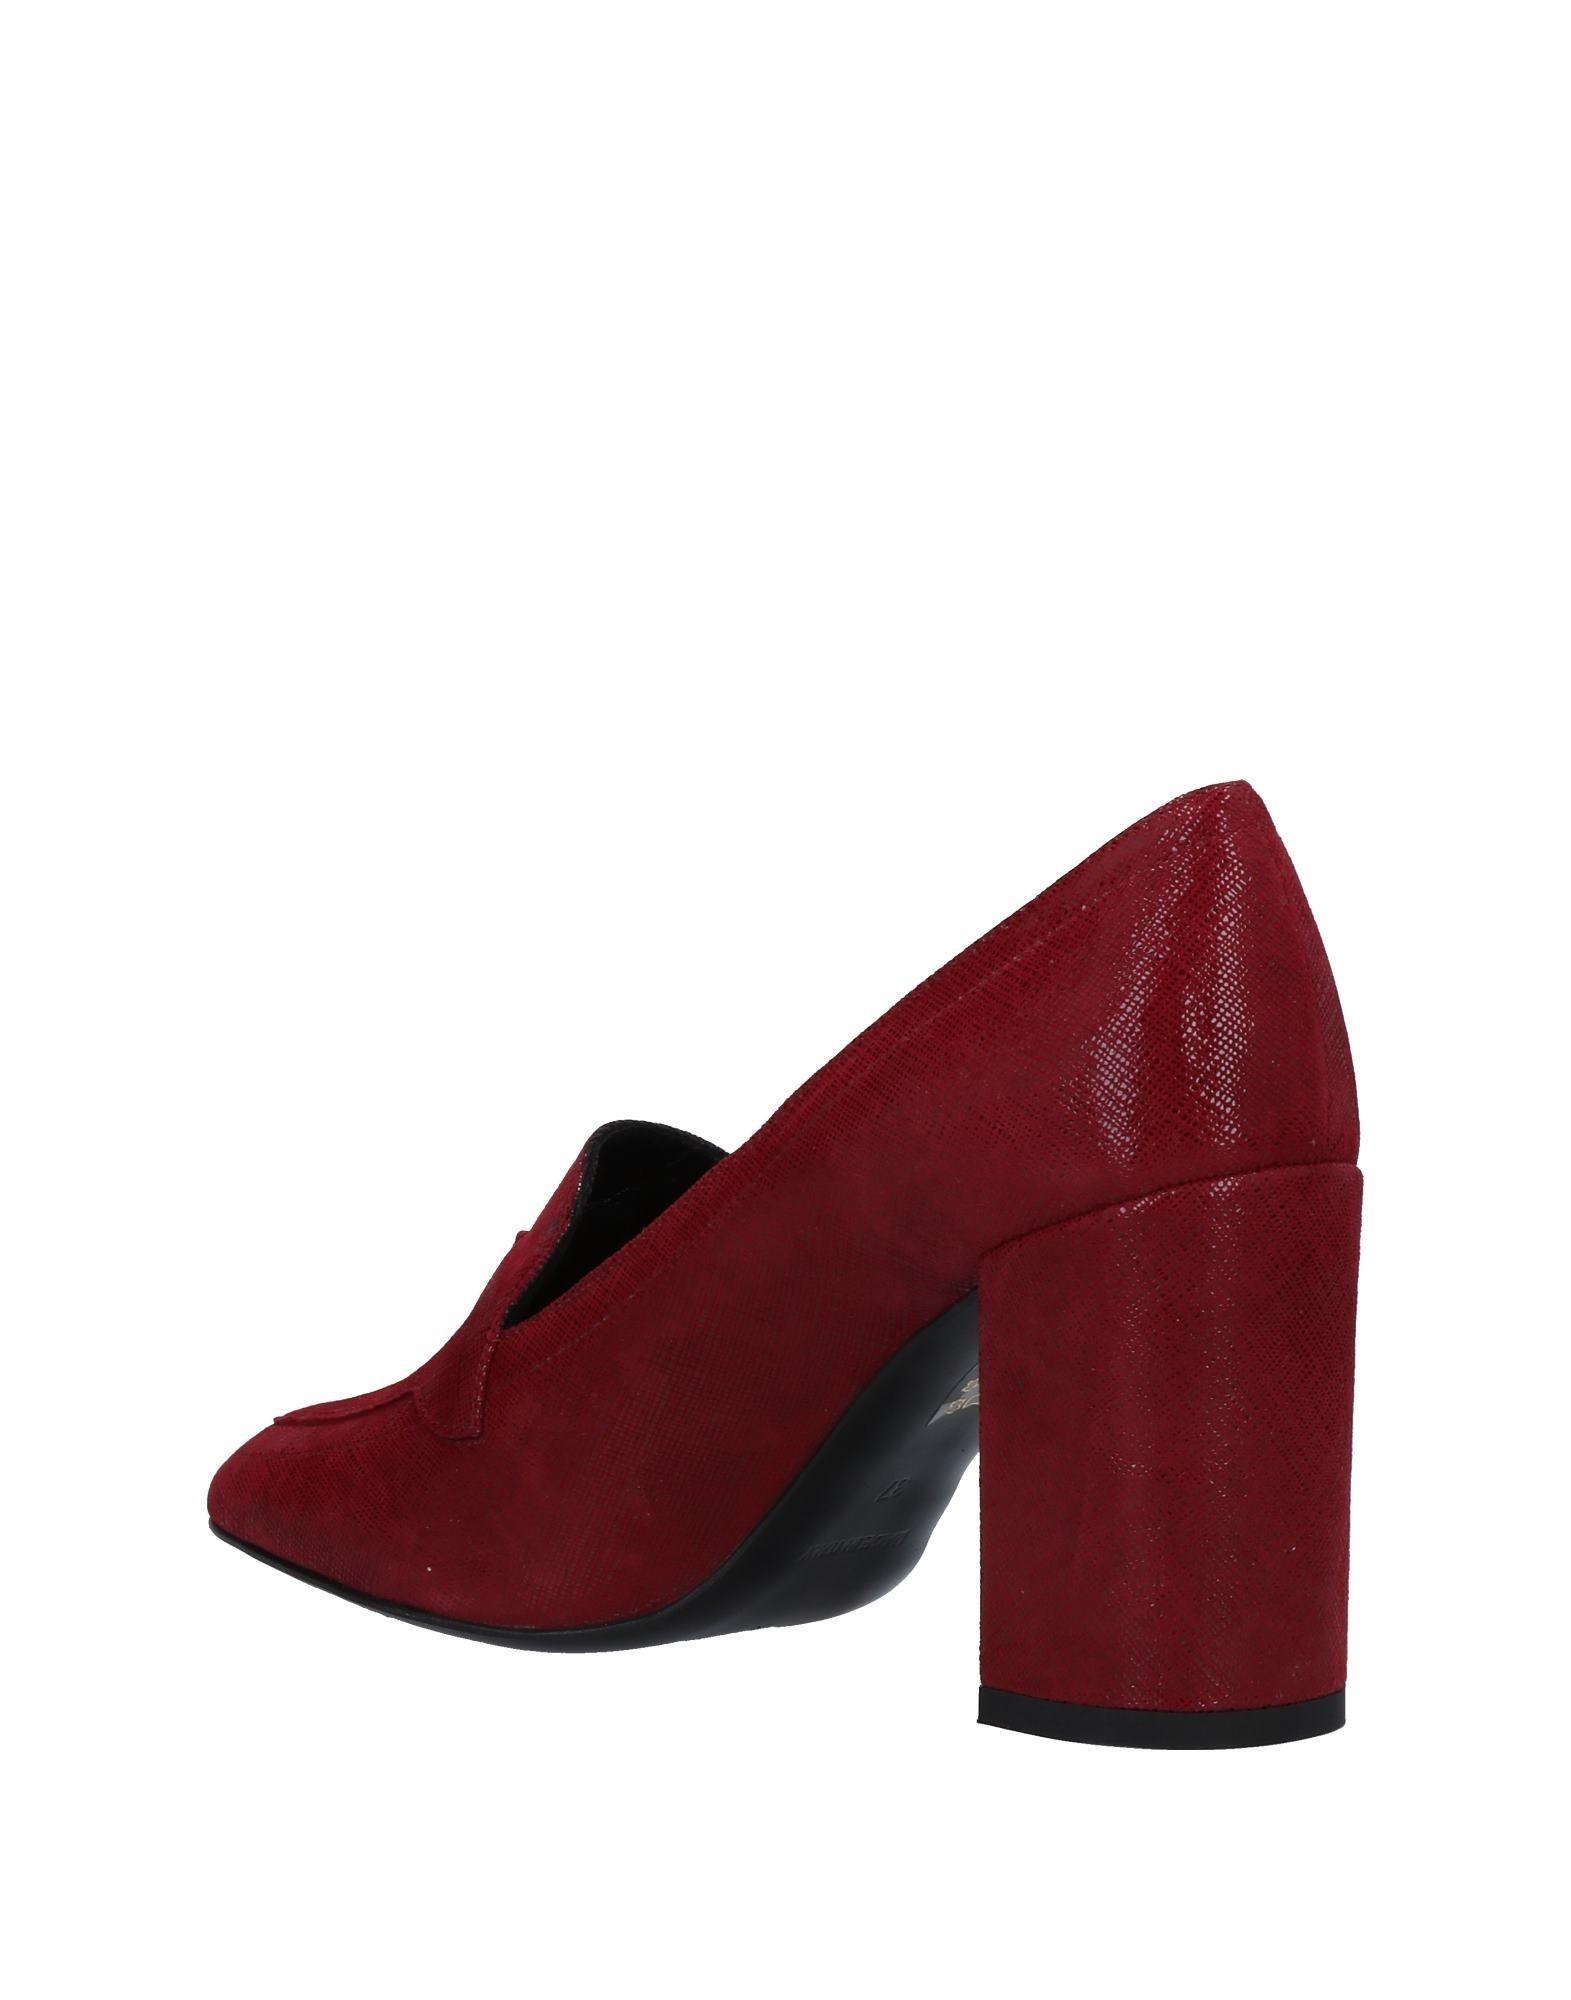 Prezioso Gute Mokassins Damen  11491100XN Gute Prezioso Qualität beliebte Schuhe fcf4bb